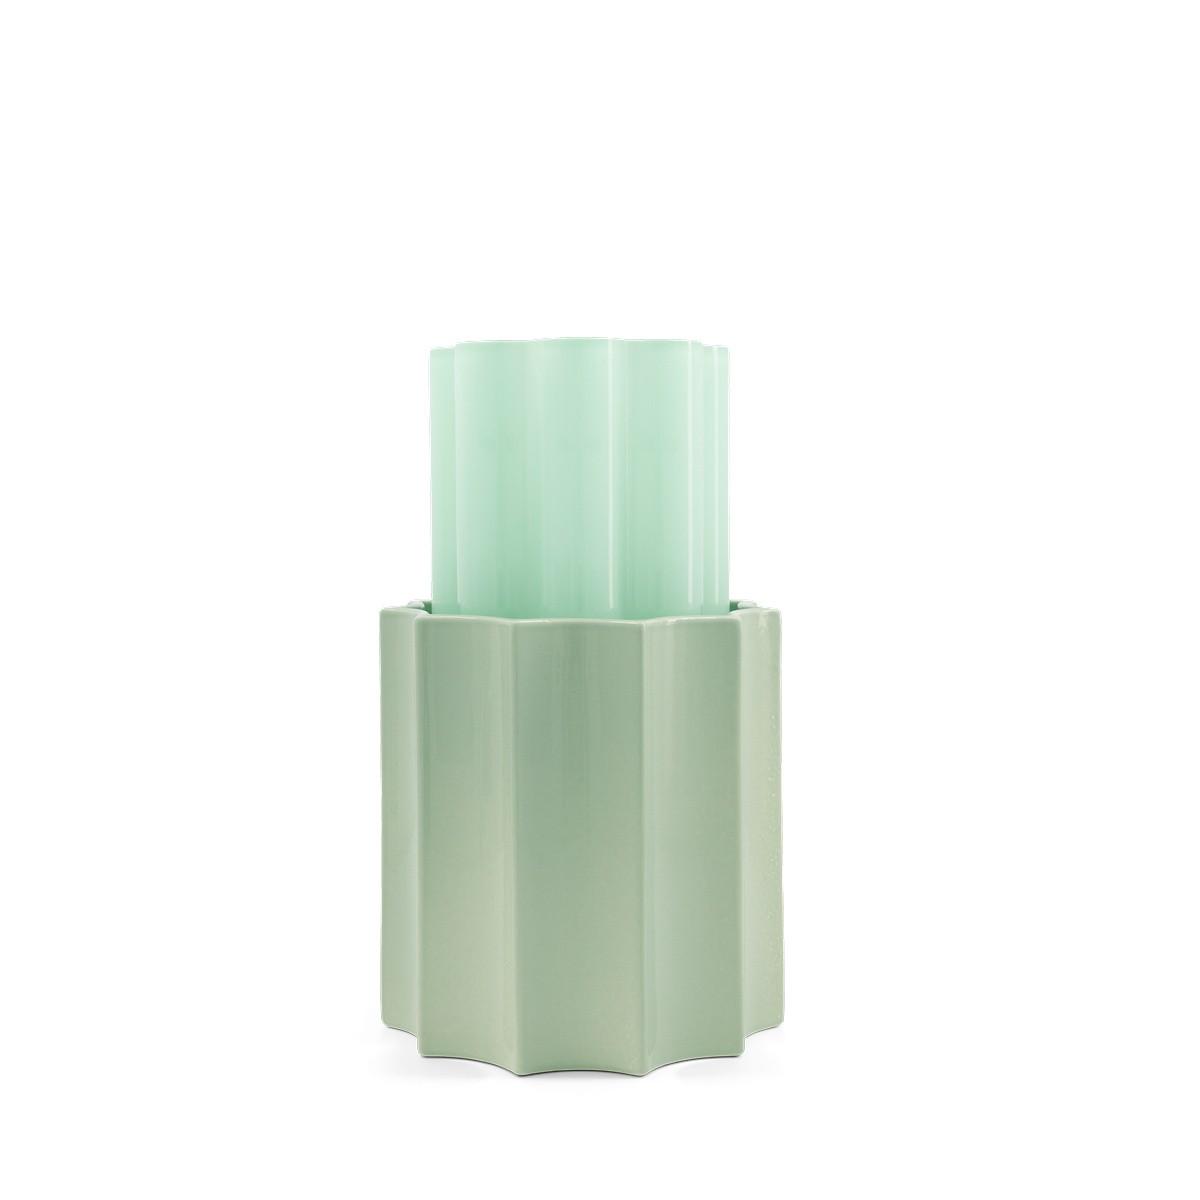 Vase Duetto vert anis et vert amande